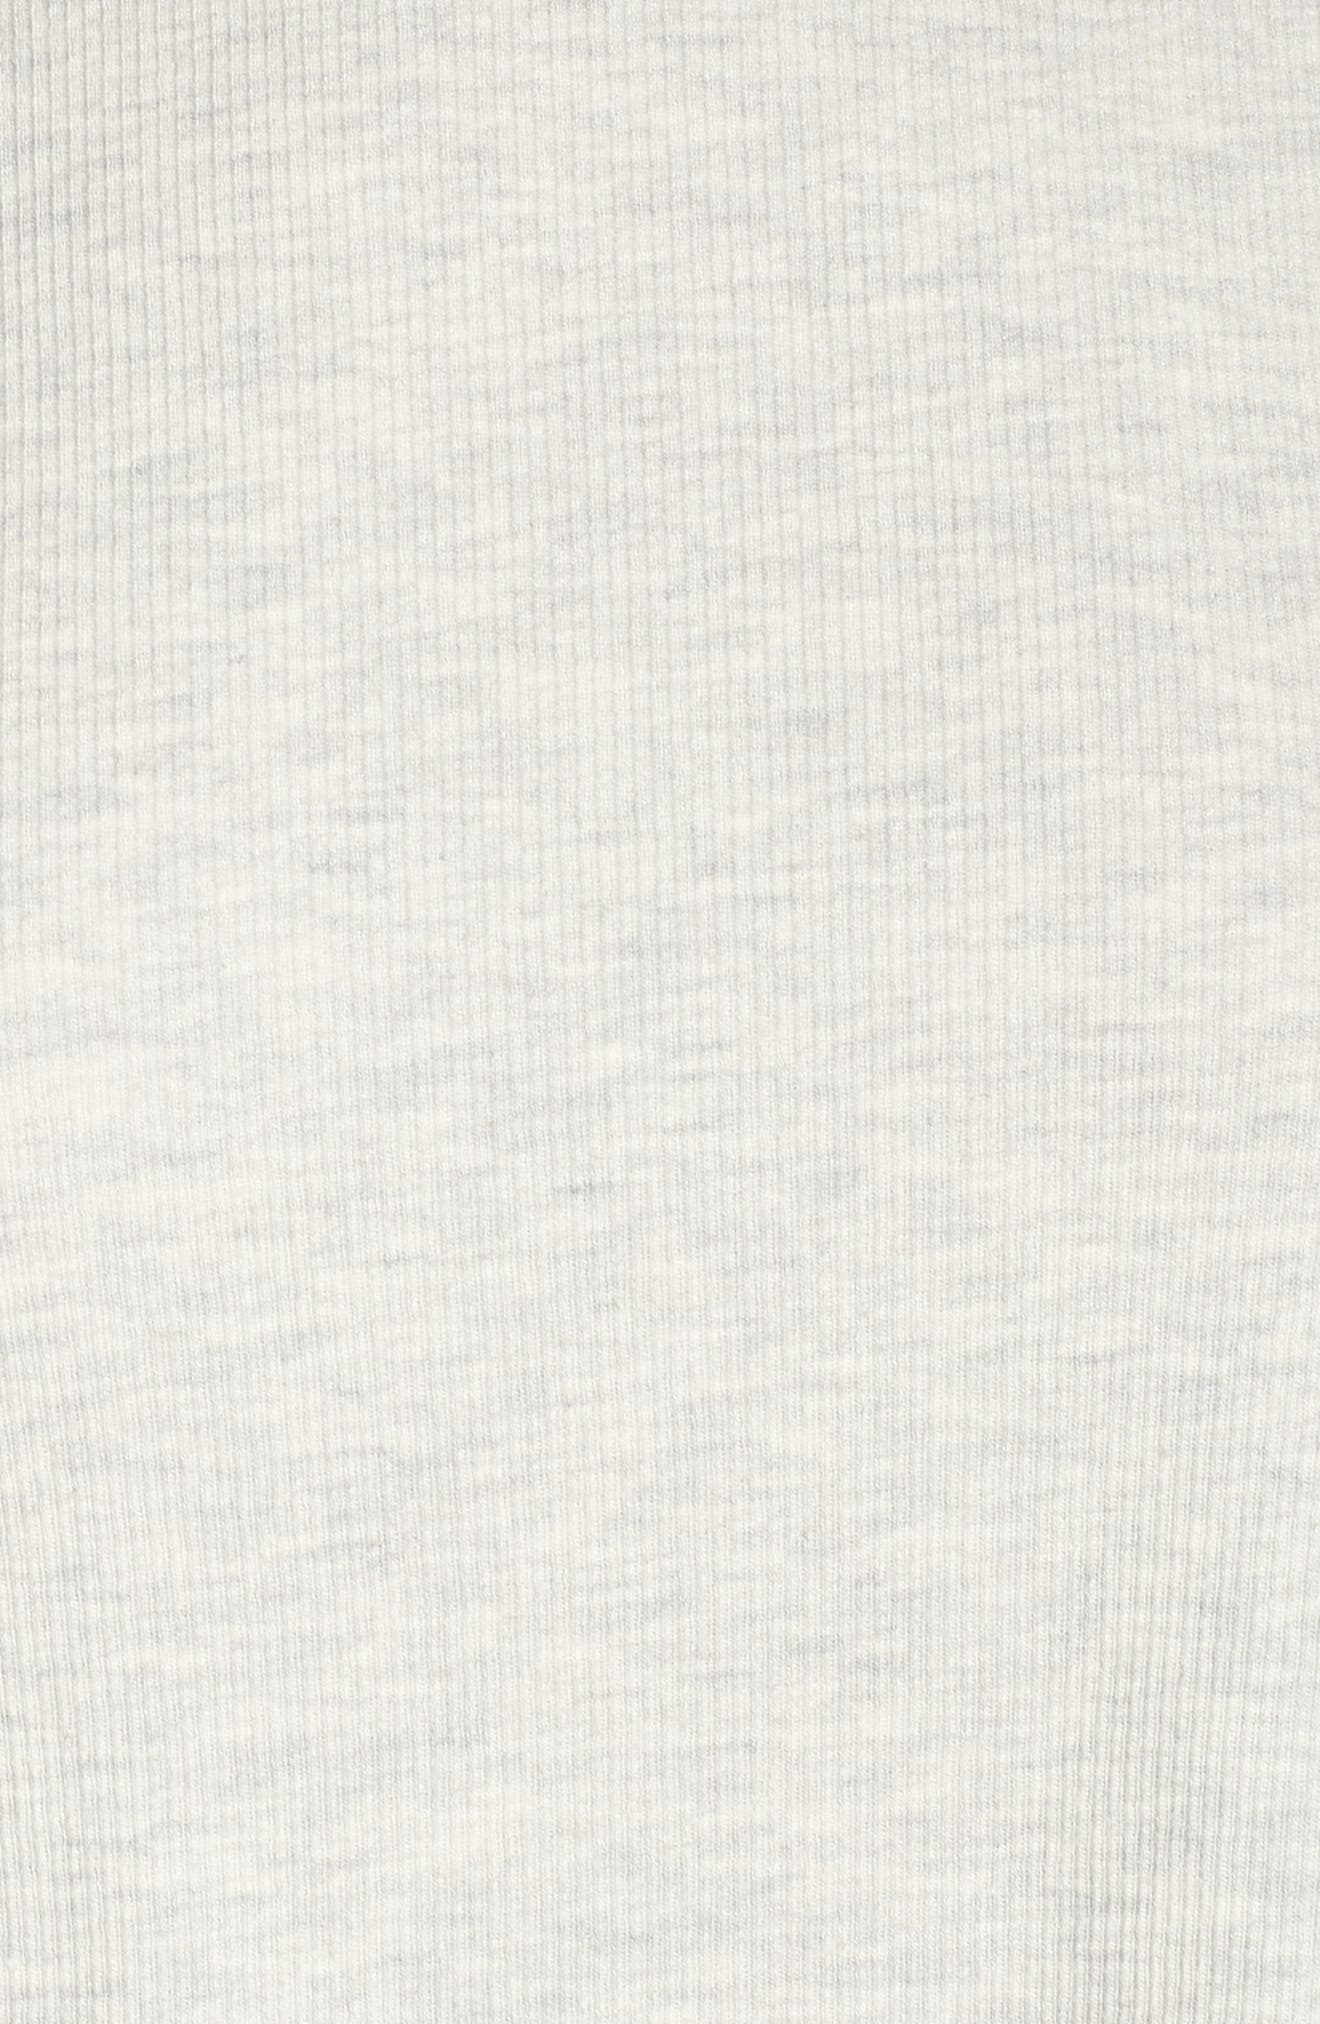 Daydream Crop Long Sleeve Tee,                             Alternate thumbnail 5, color,                             061